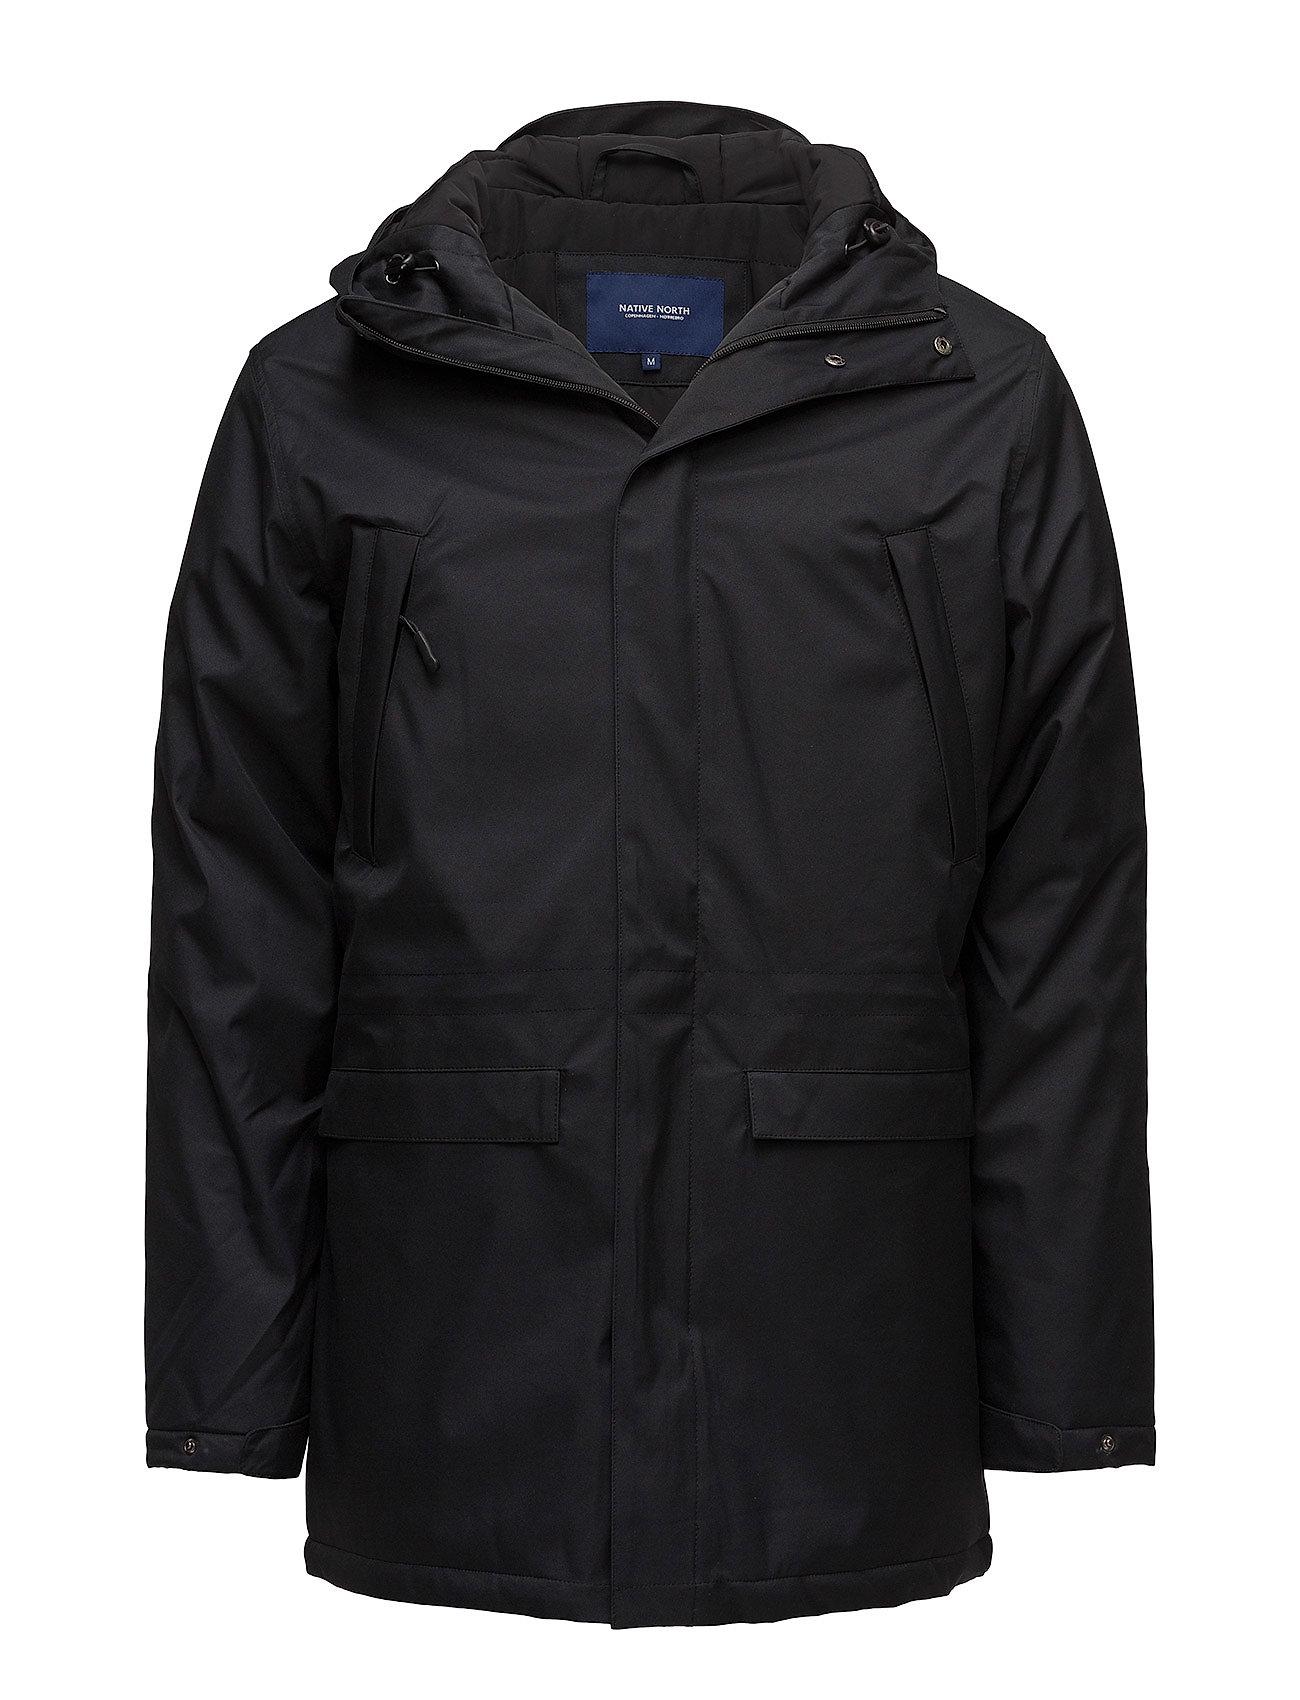 native north – Storm parka jacket på boozt.com dk